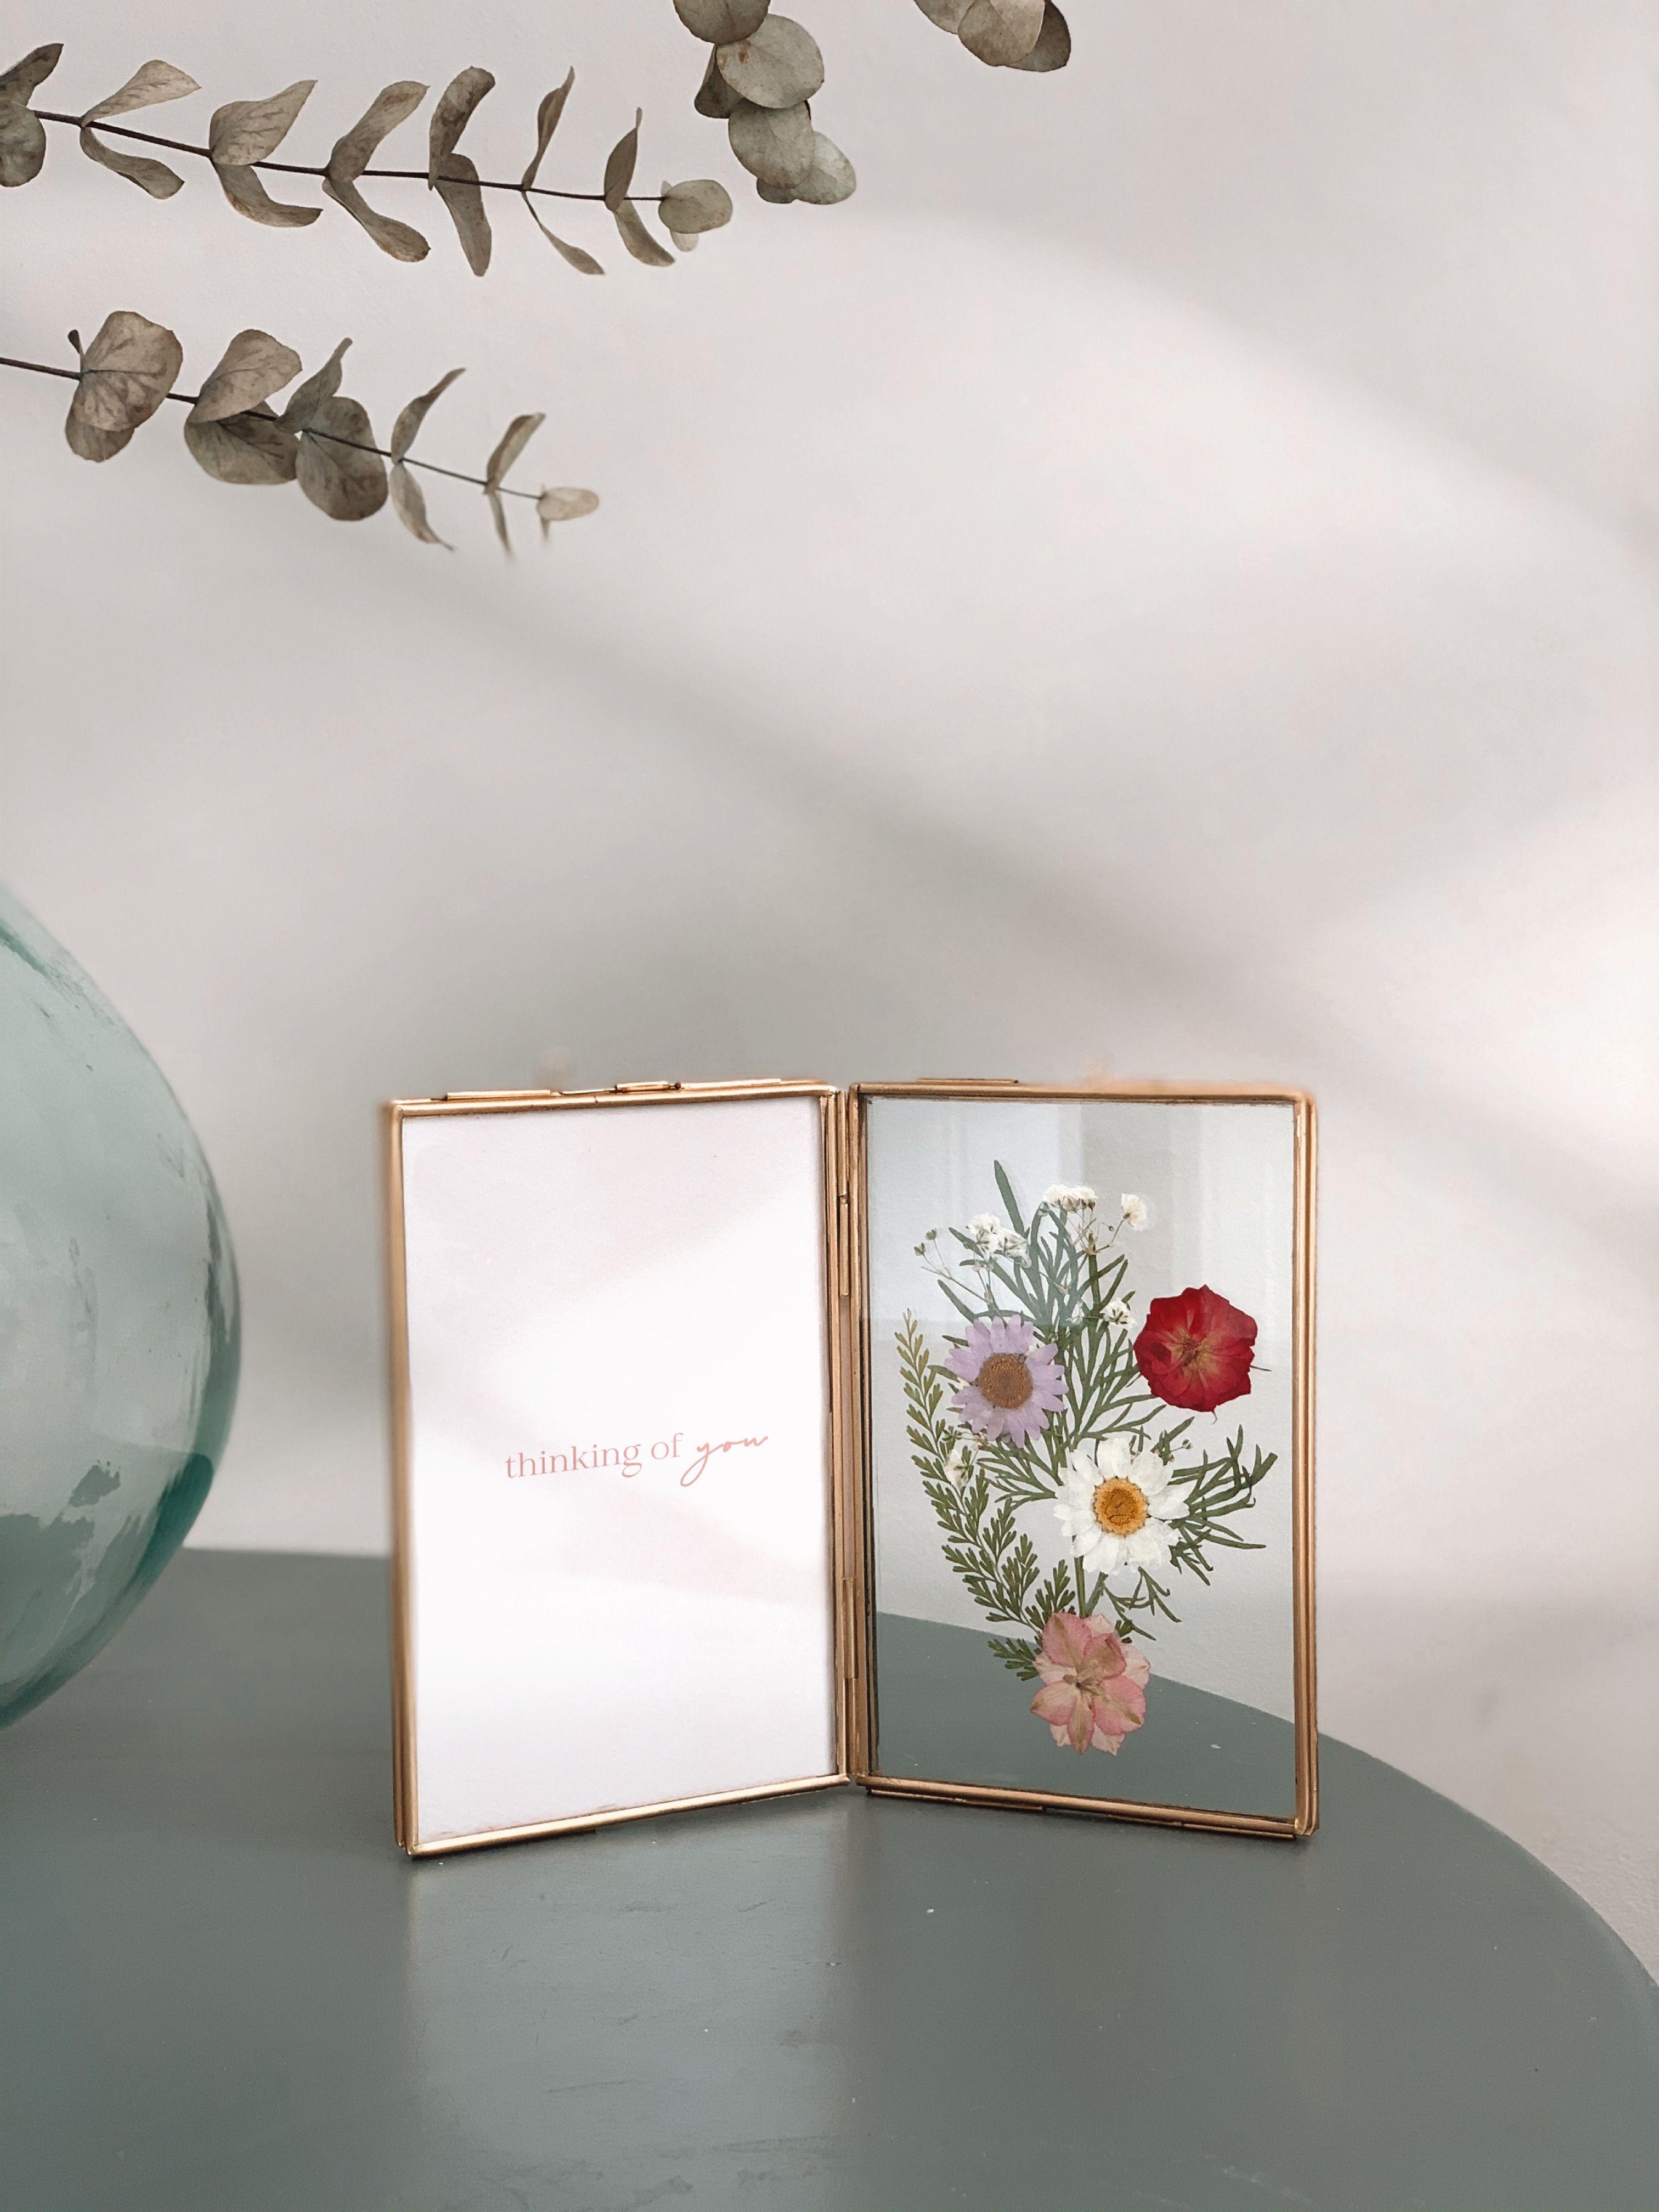 Antique Brass Folding Metal Frame With Pressed Flowers Pressed Flowers Frame Pressed Flowers Wedding Frames